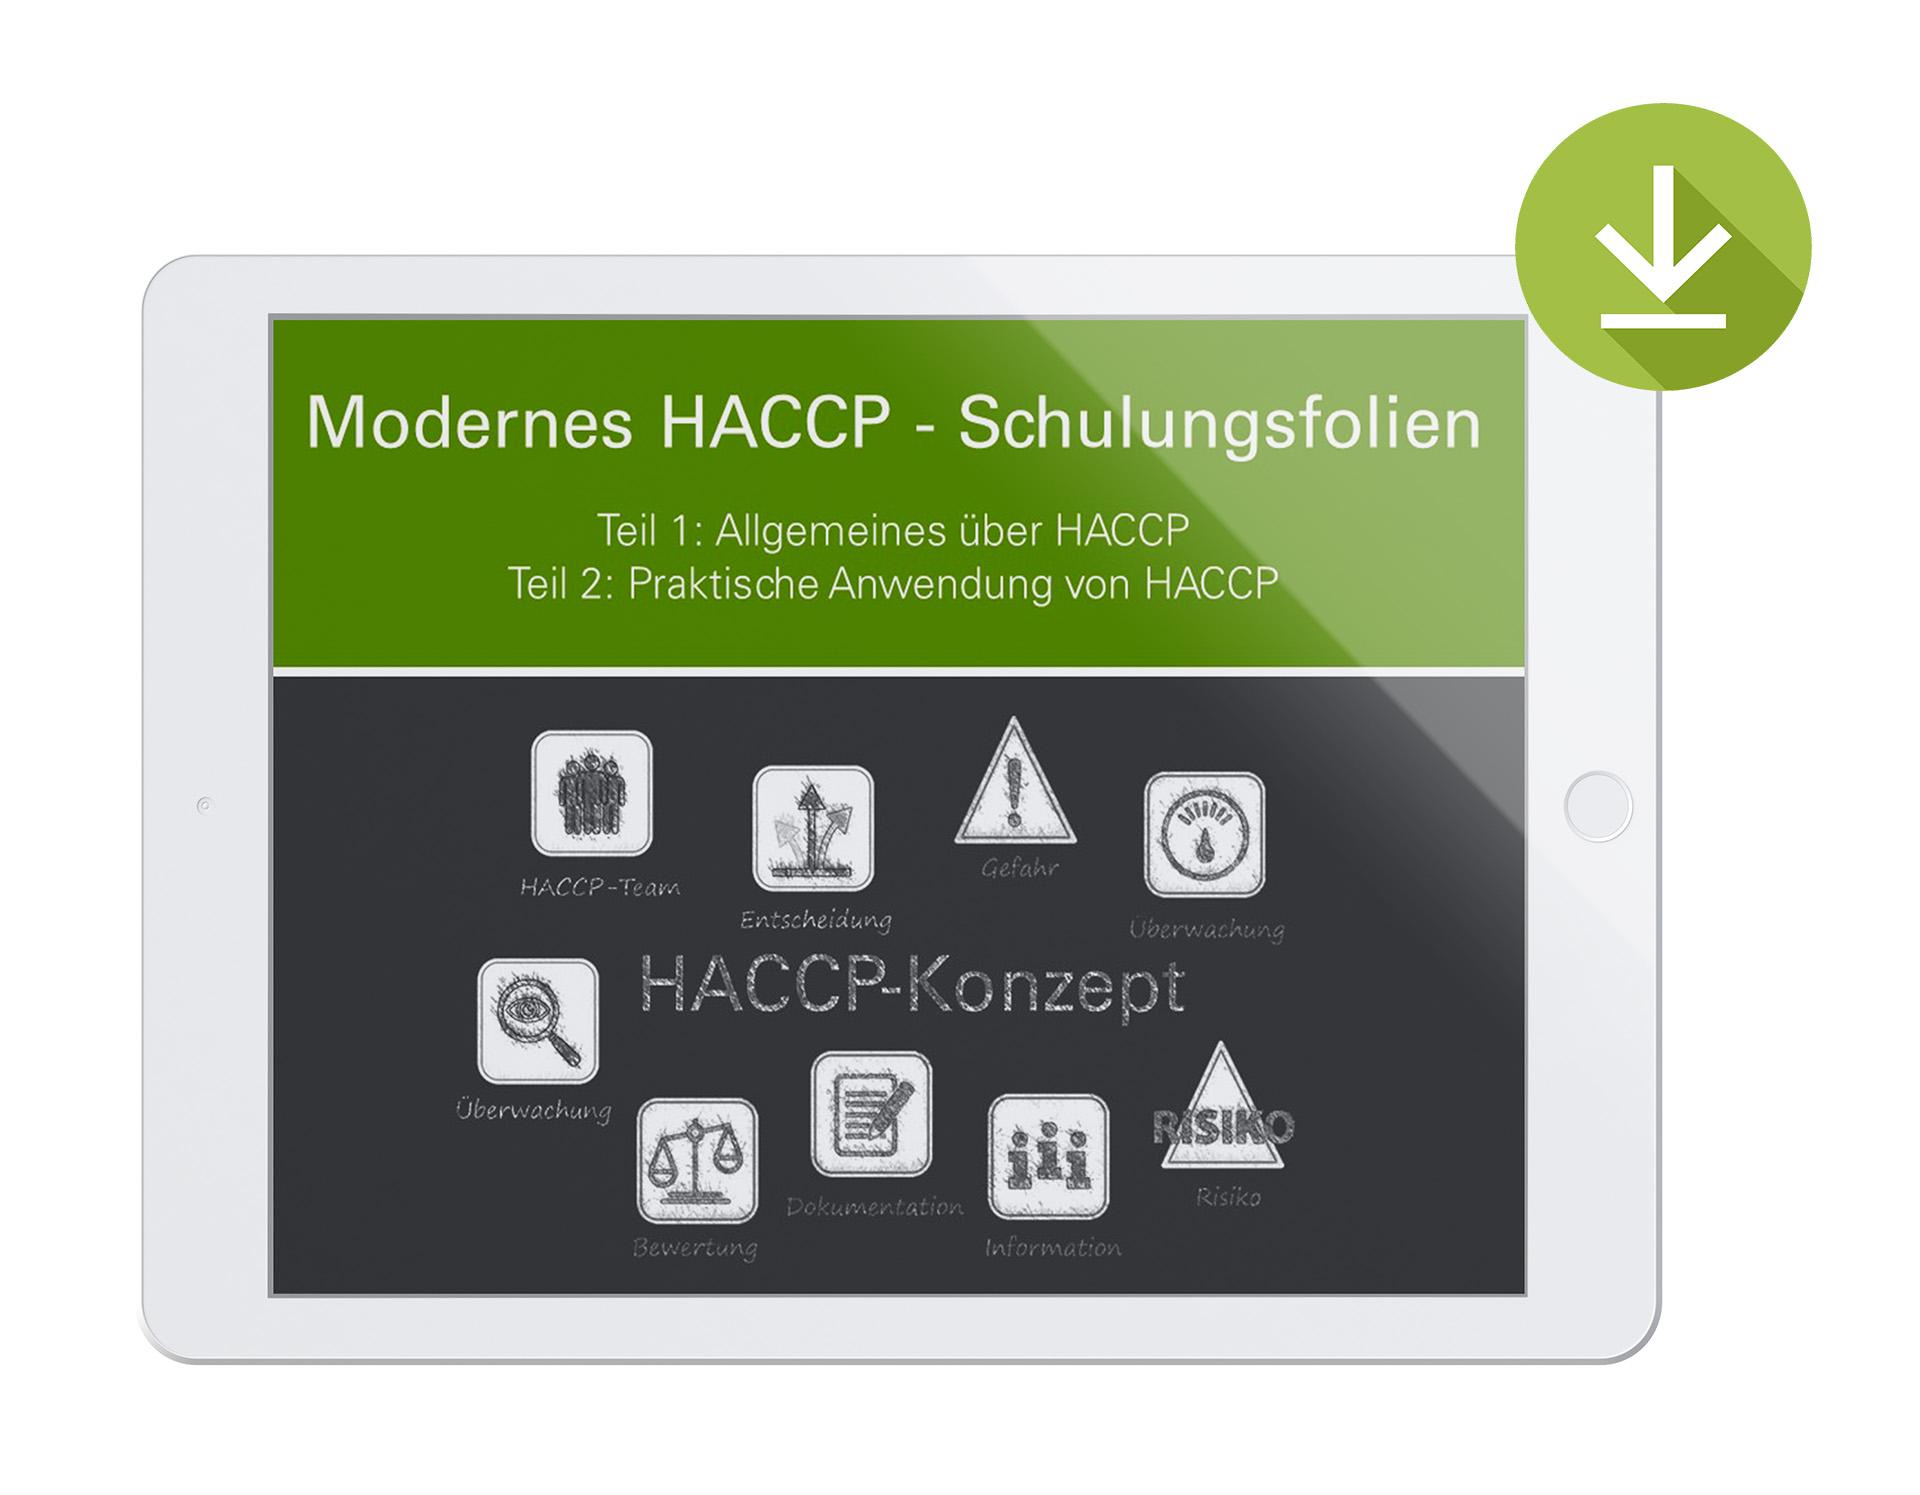 Schulungsfolien zu Modernes HACCP - Zum Download